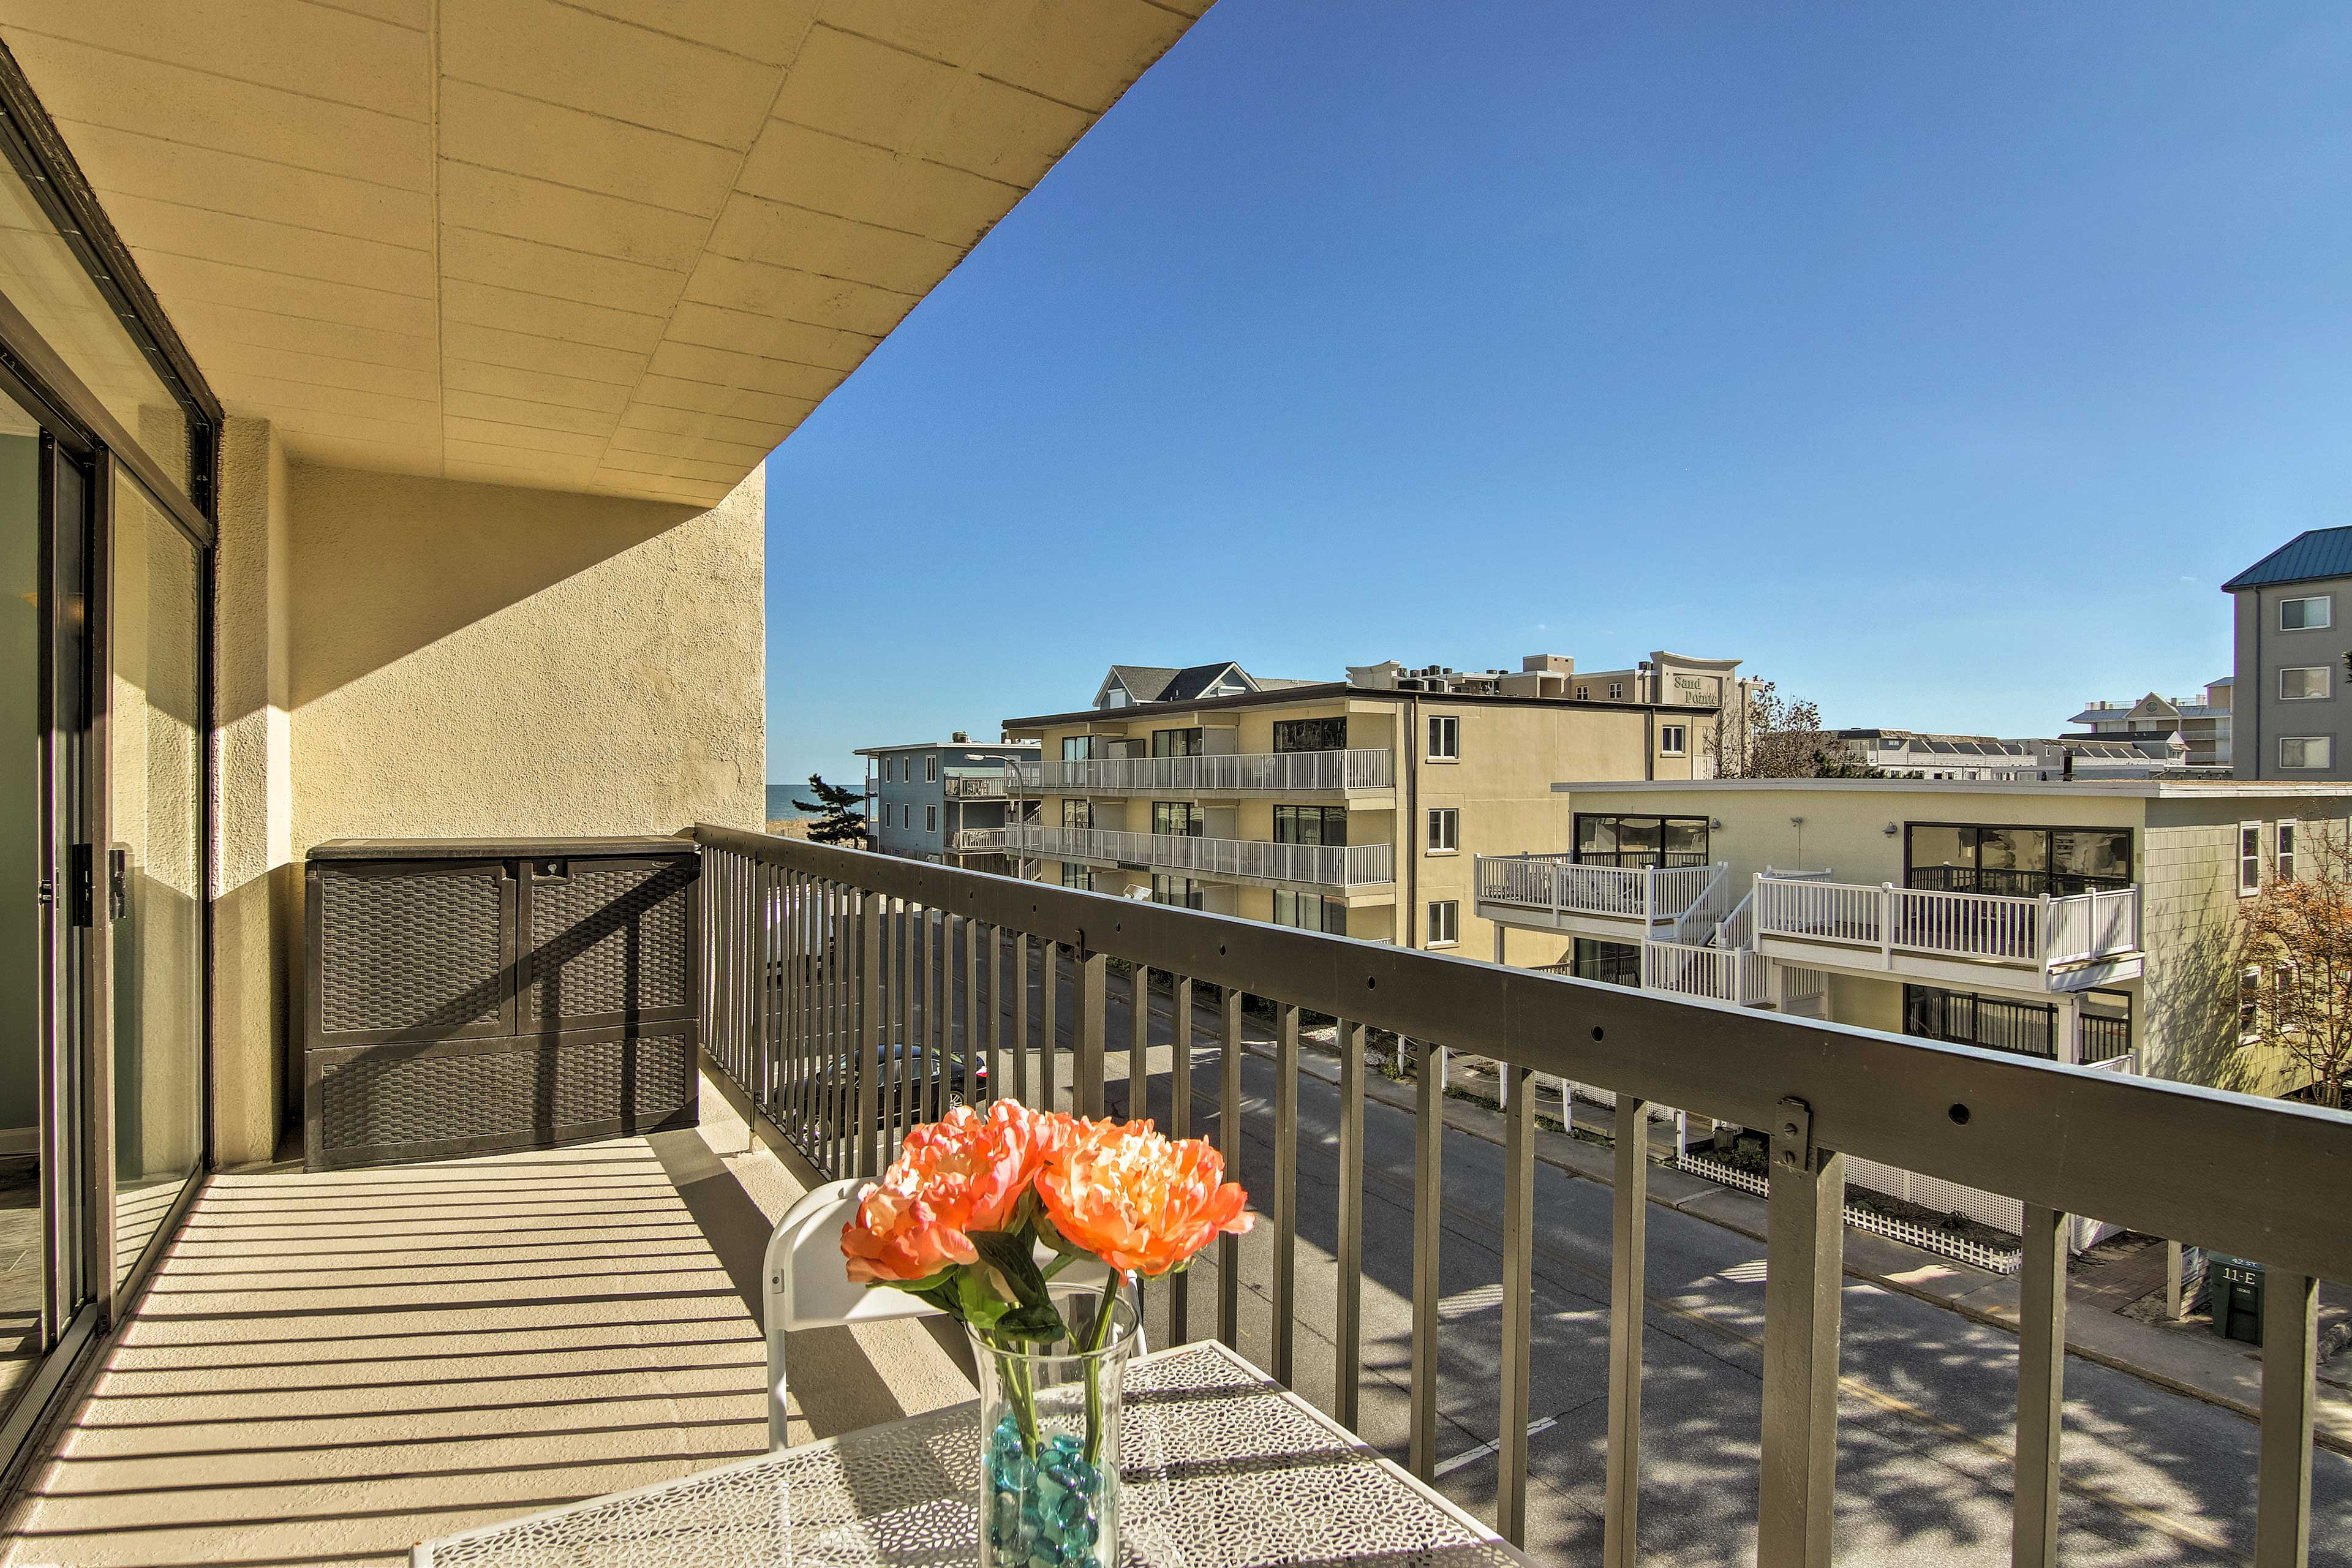 Sip coffee & evening nightcaps on the balcony, with peek-a-boo ocean views.